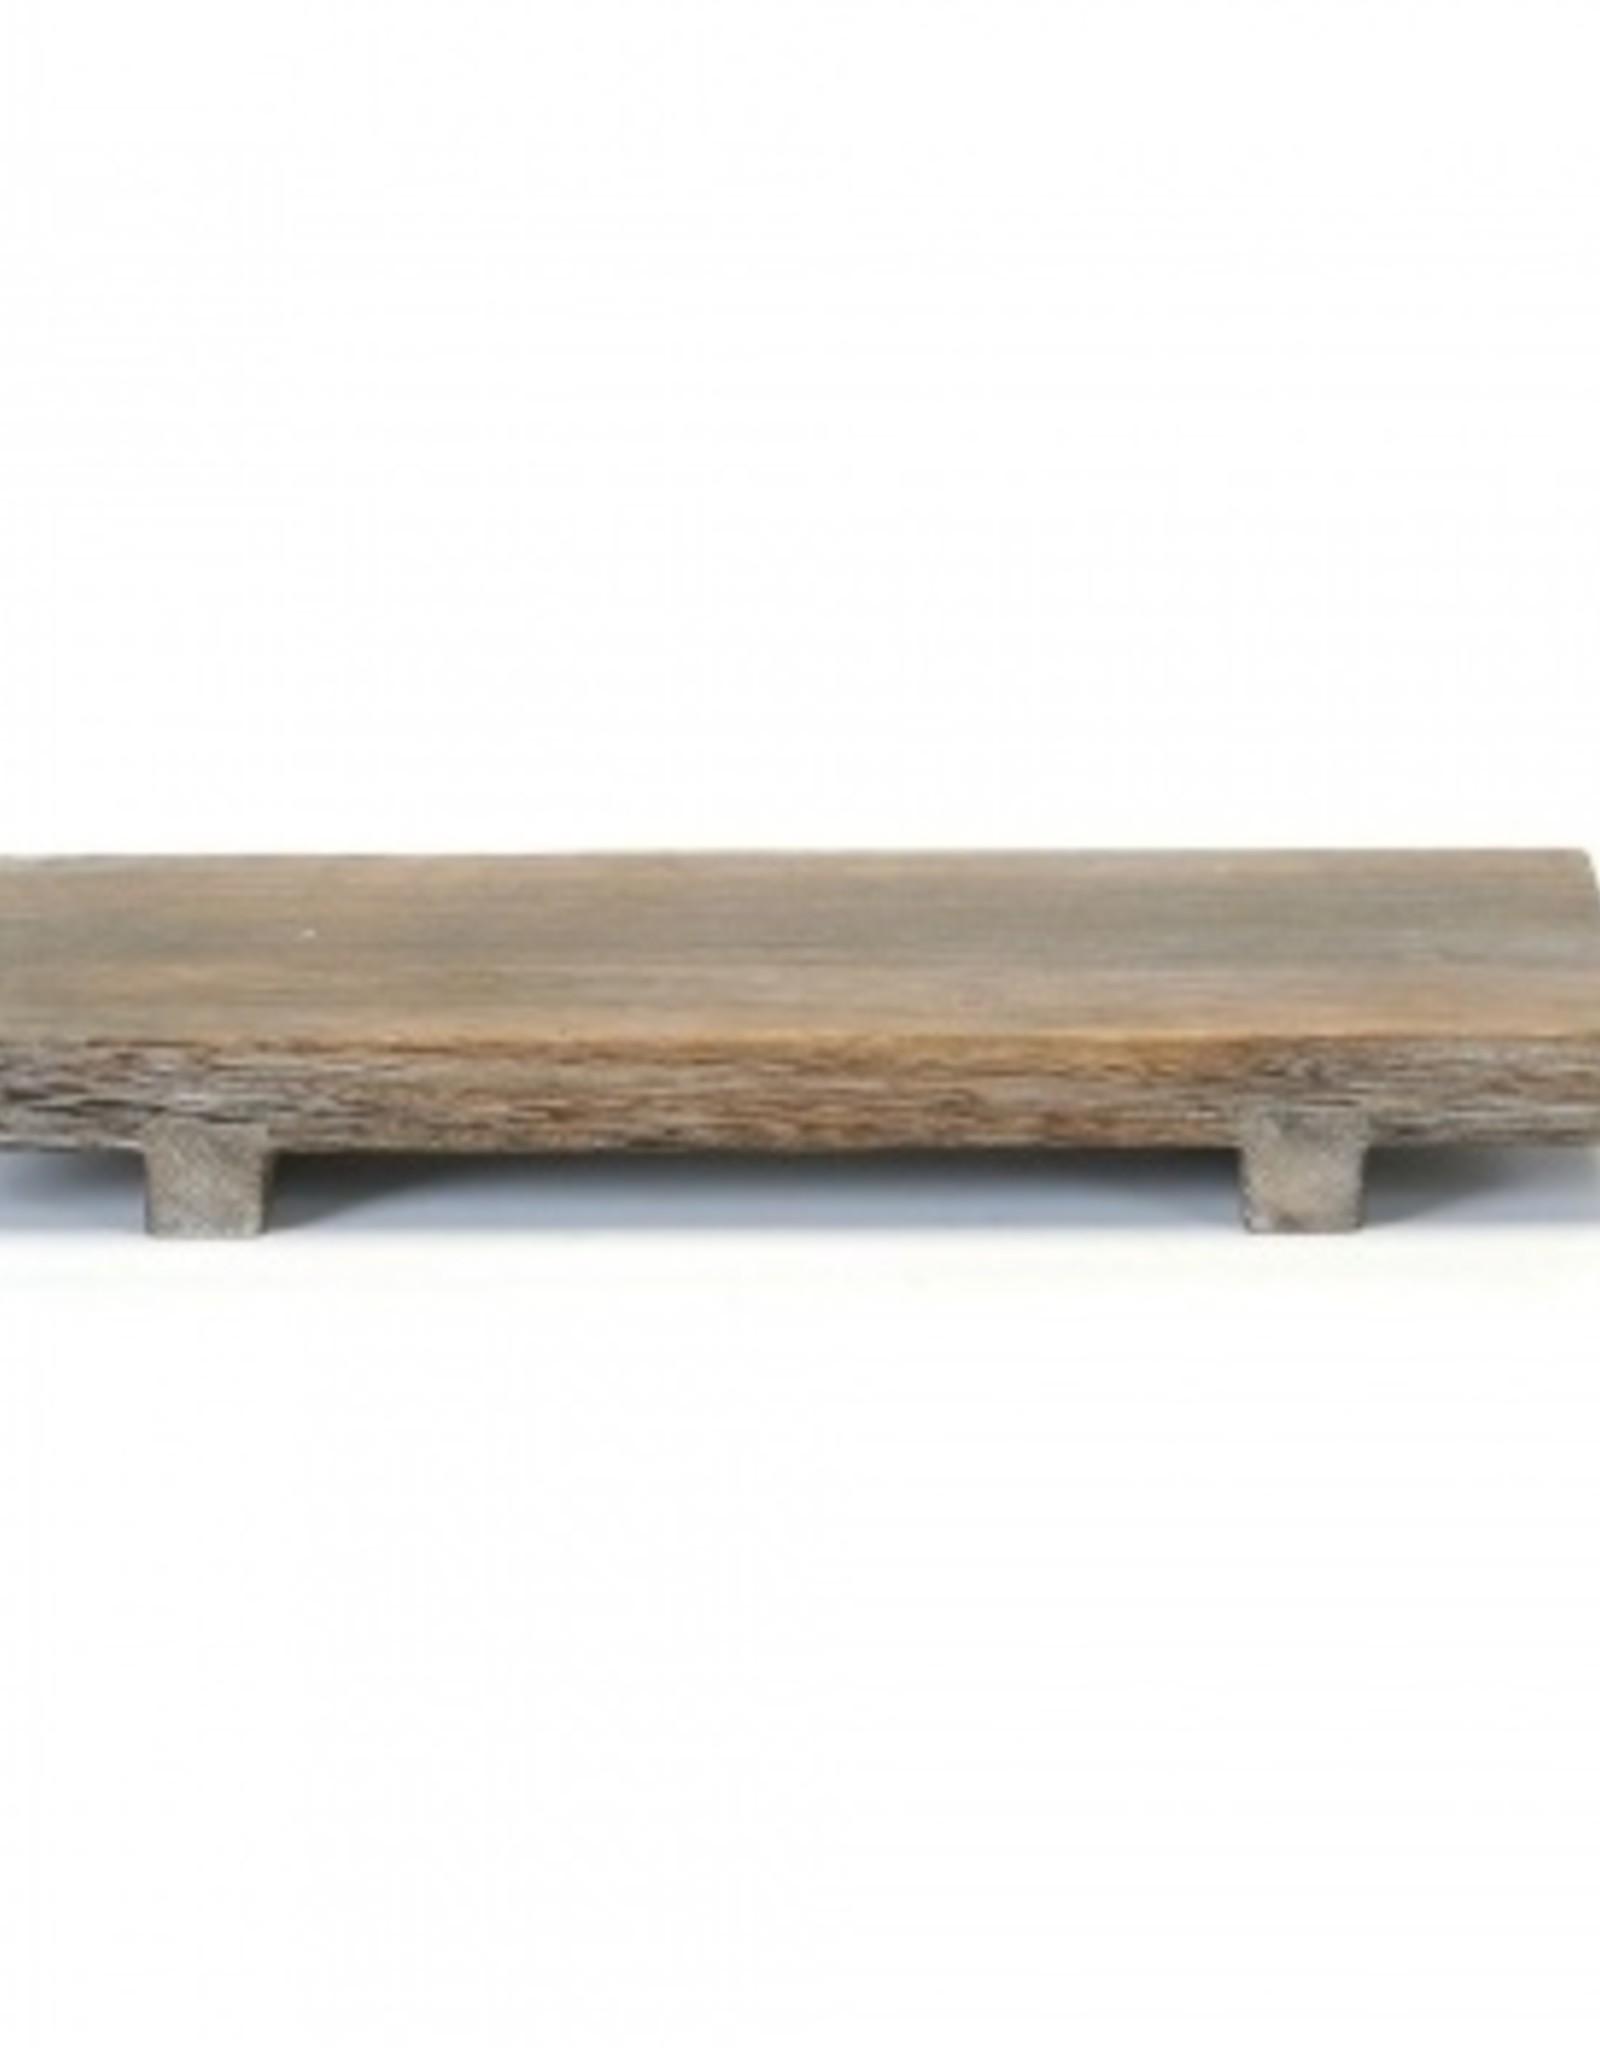 Wood Display Board (small)